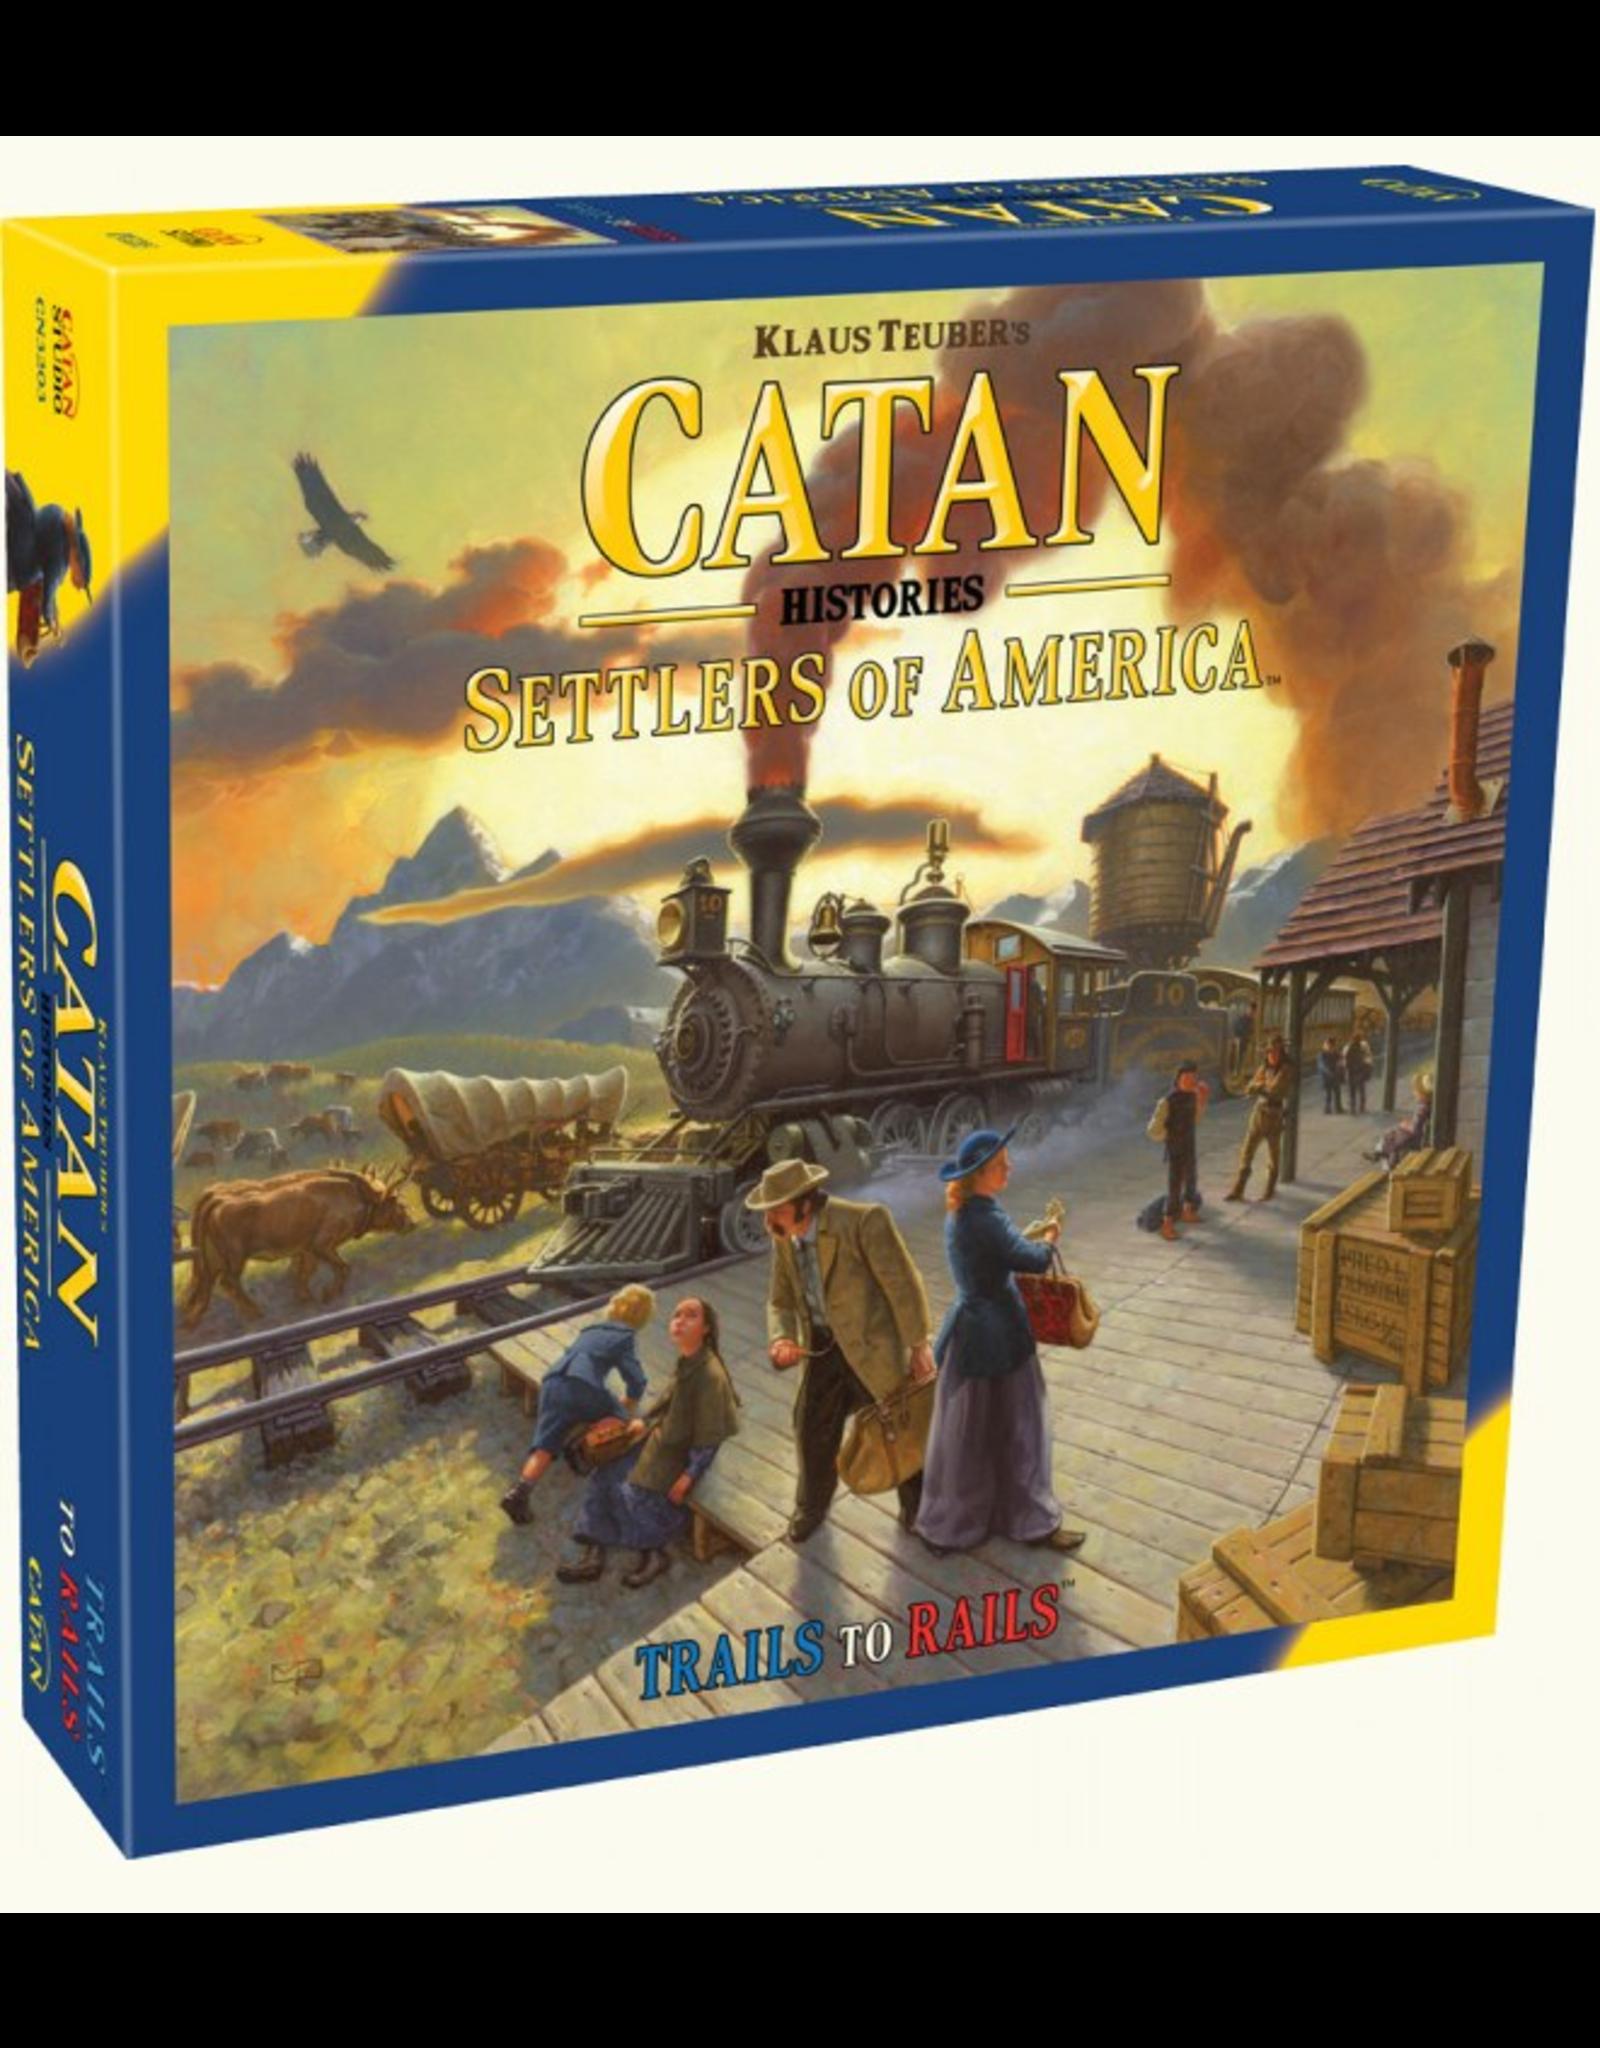 Catan Studios Catan Histories: Settlers of America Trails to Rails